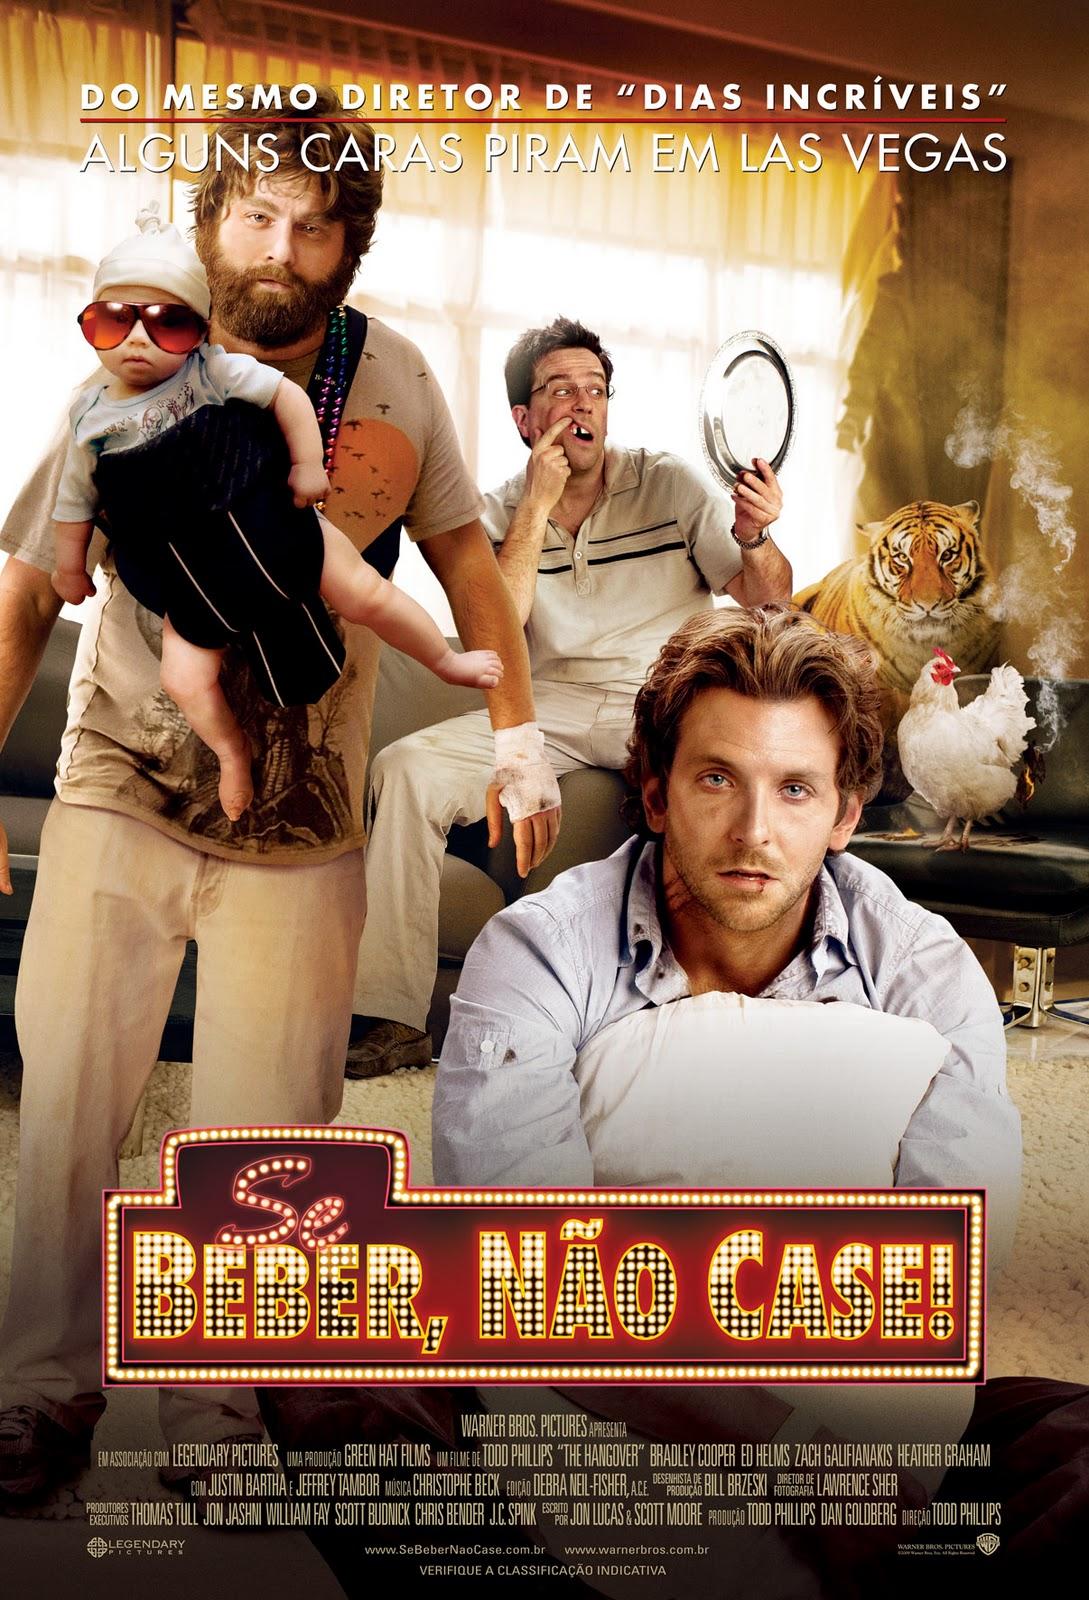 http://1.bp.blogspot.com/_srPT4xxsDdU/TMMsE2vXVwI/AAAAAAAABSw/ohIslV-RWYM/s1600/cartaz-filme-se-beber-nao-case.jpg